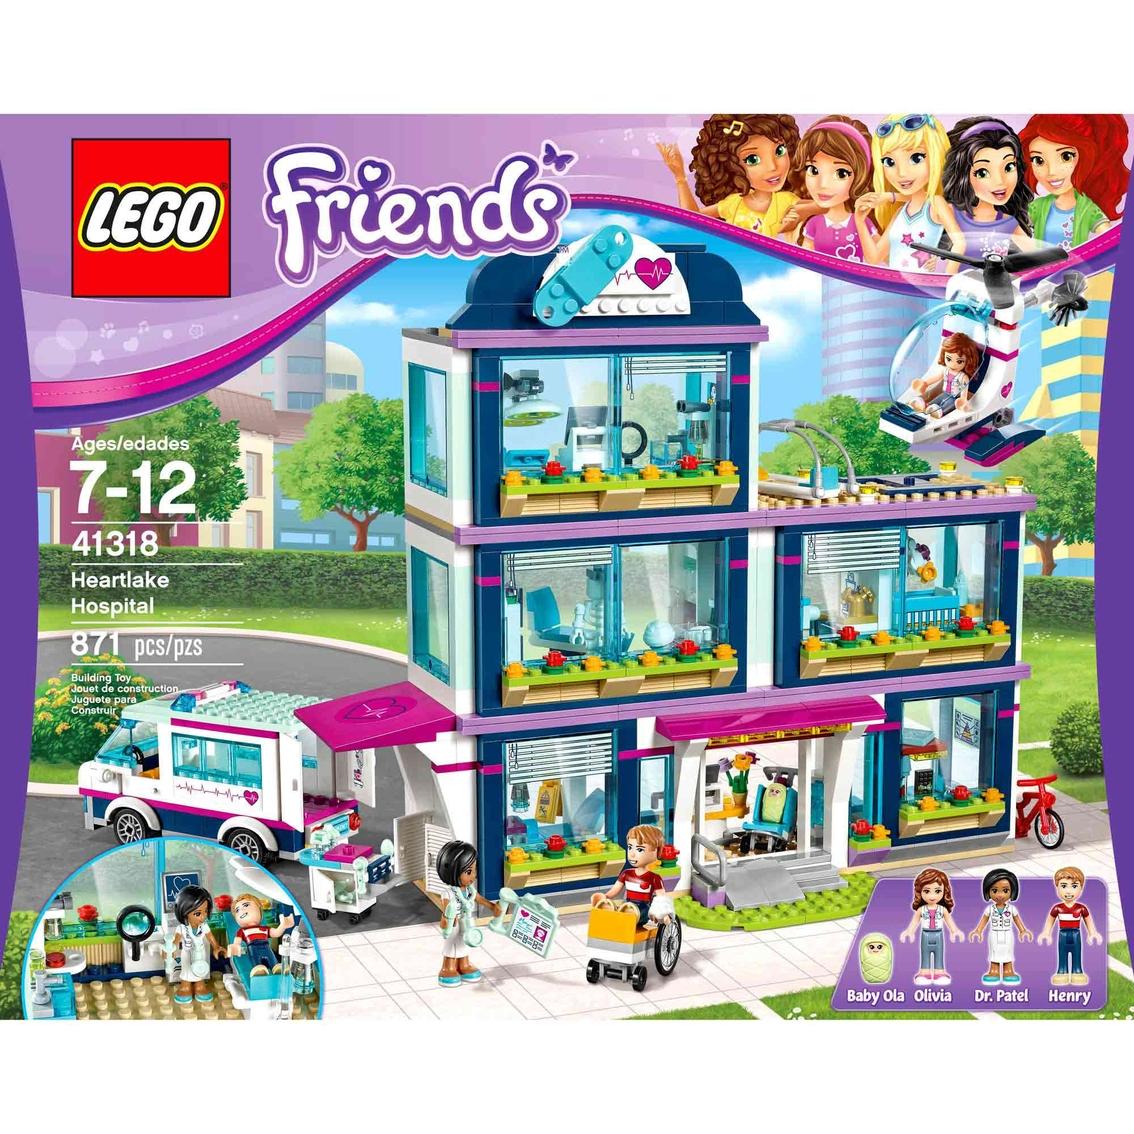 Lego Friends Heartlake Hospital Lego Friends Baby Toys Shop